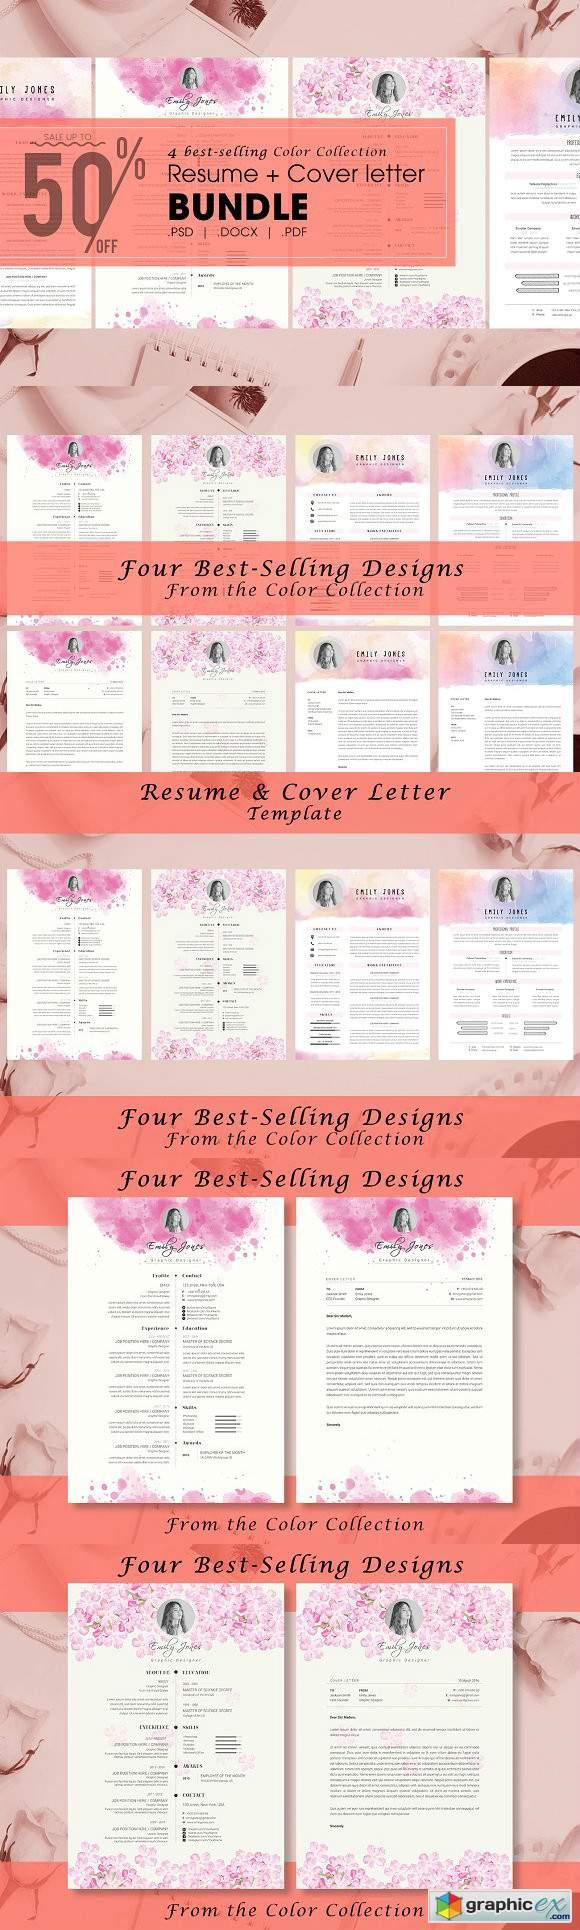 Resume Color Bundle